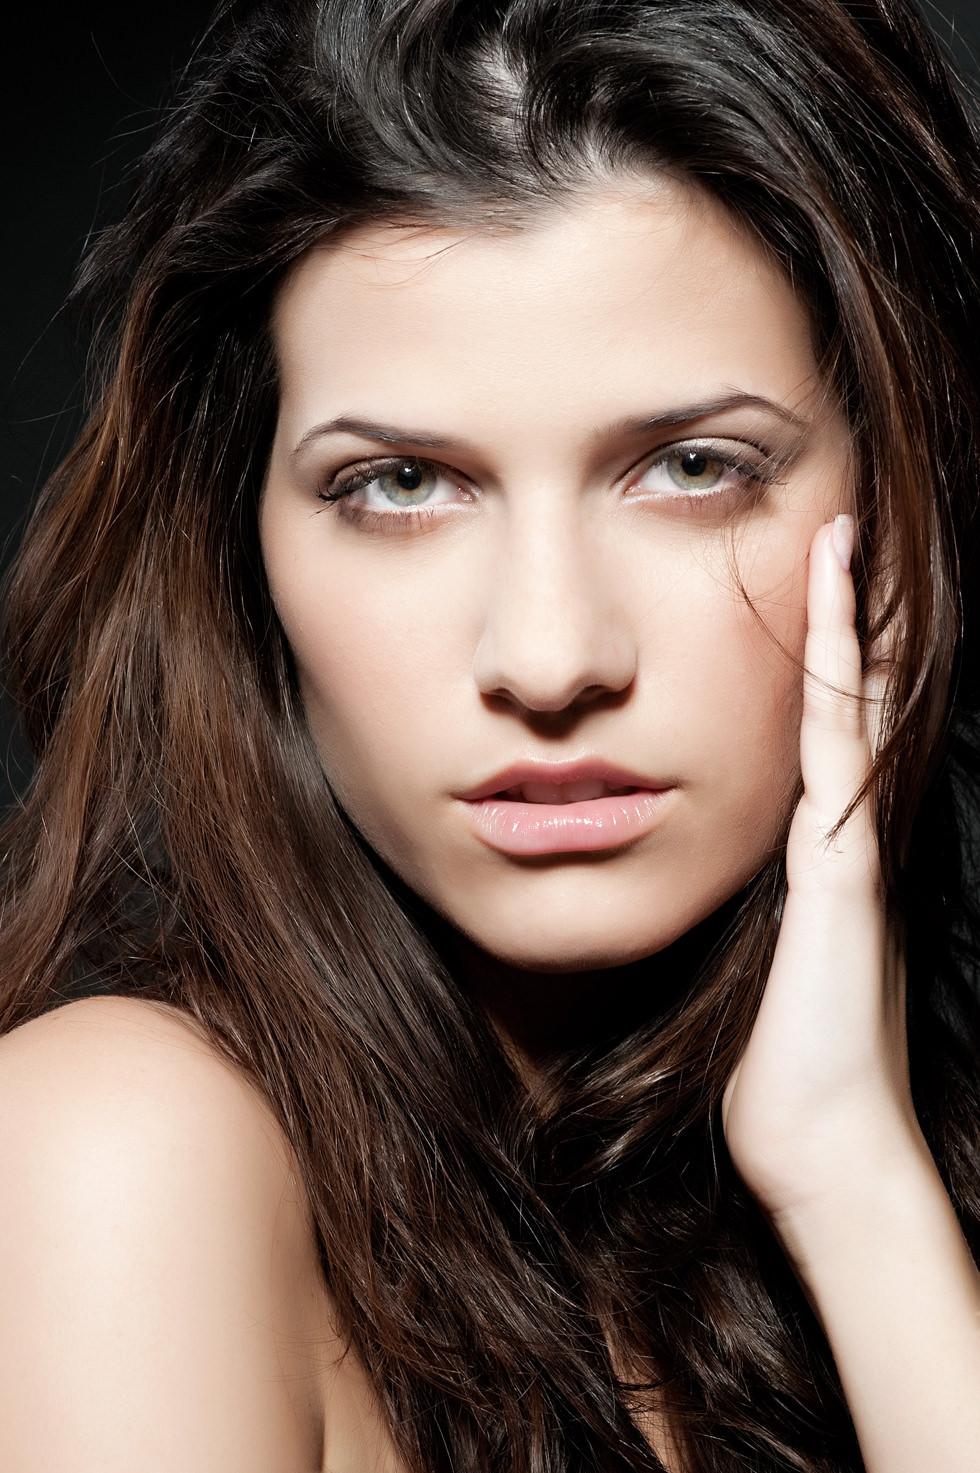 Portraits & Beauty 020.jpg